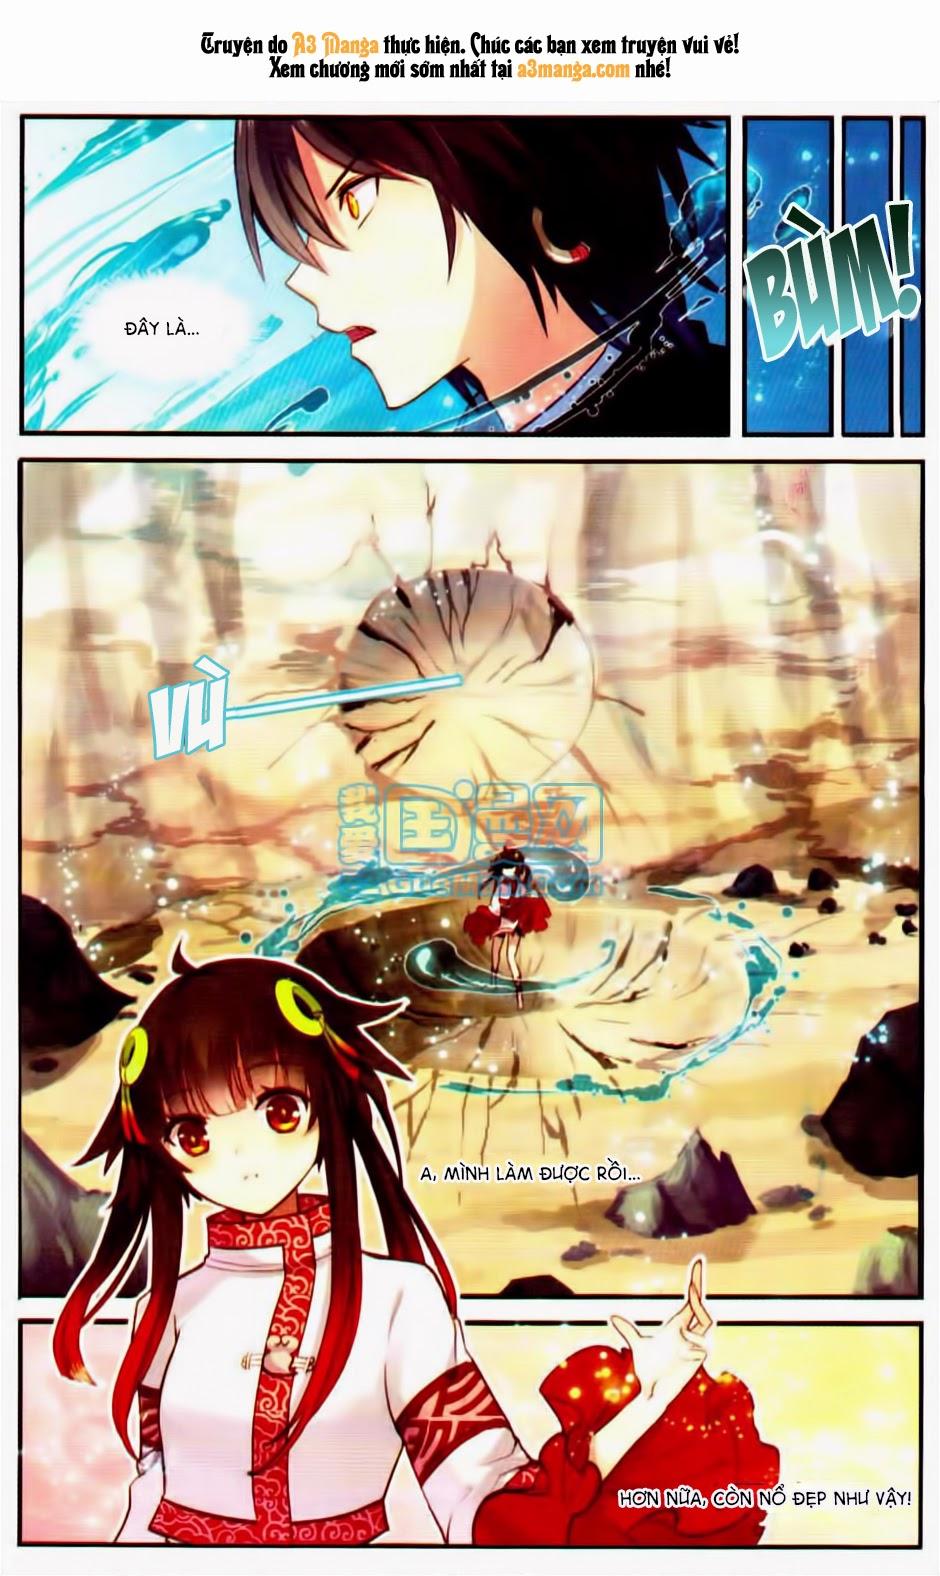 a3manga.com thien hanh thiet su chap 19